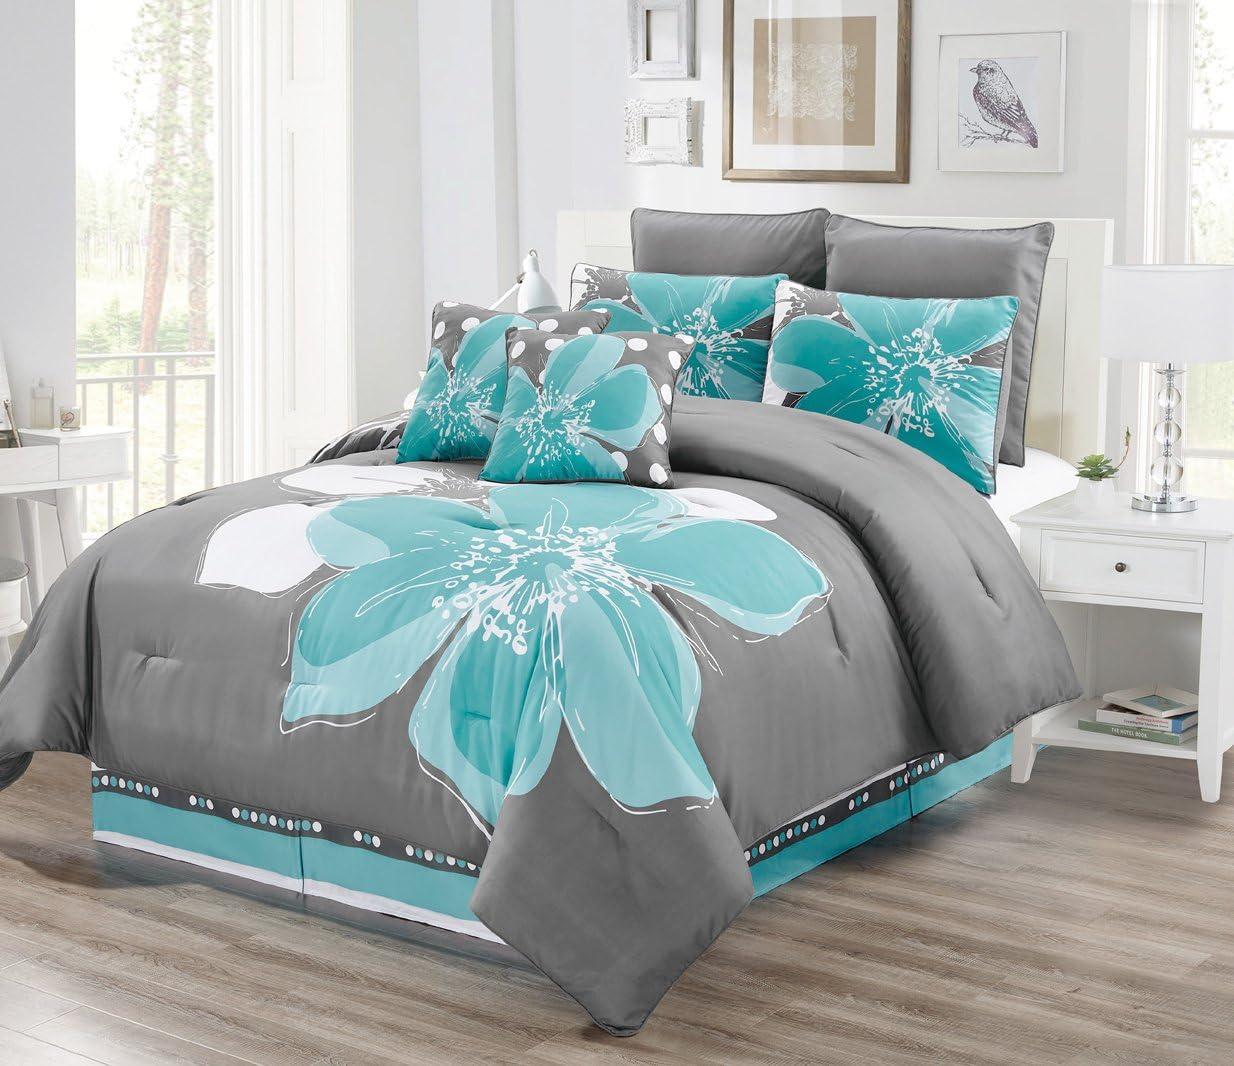 Amazon Com 8 Piece Aqua Blue Grey White Floral Comforter Set